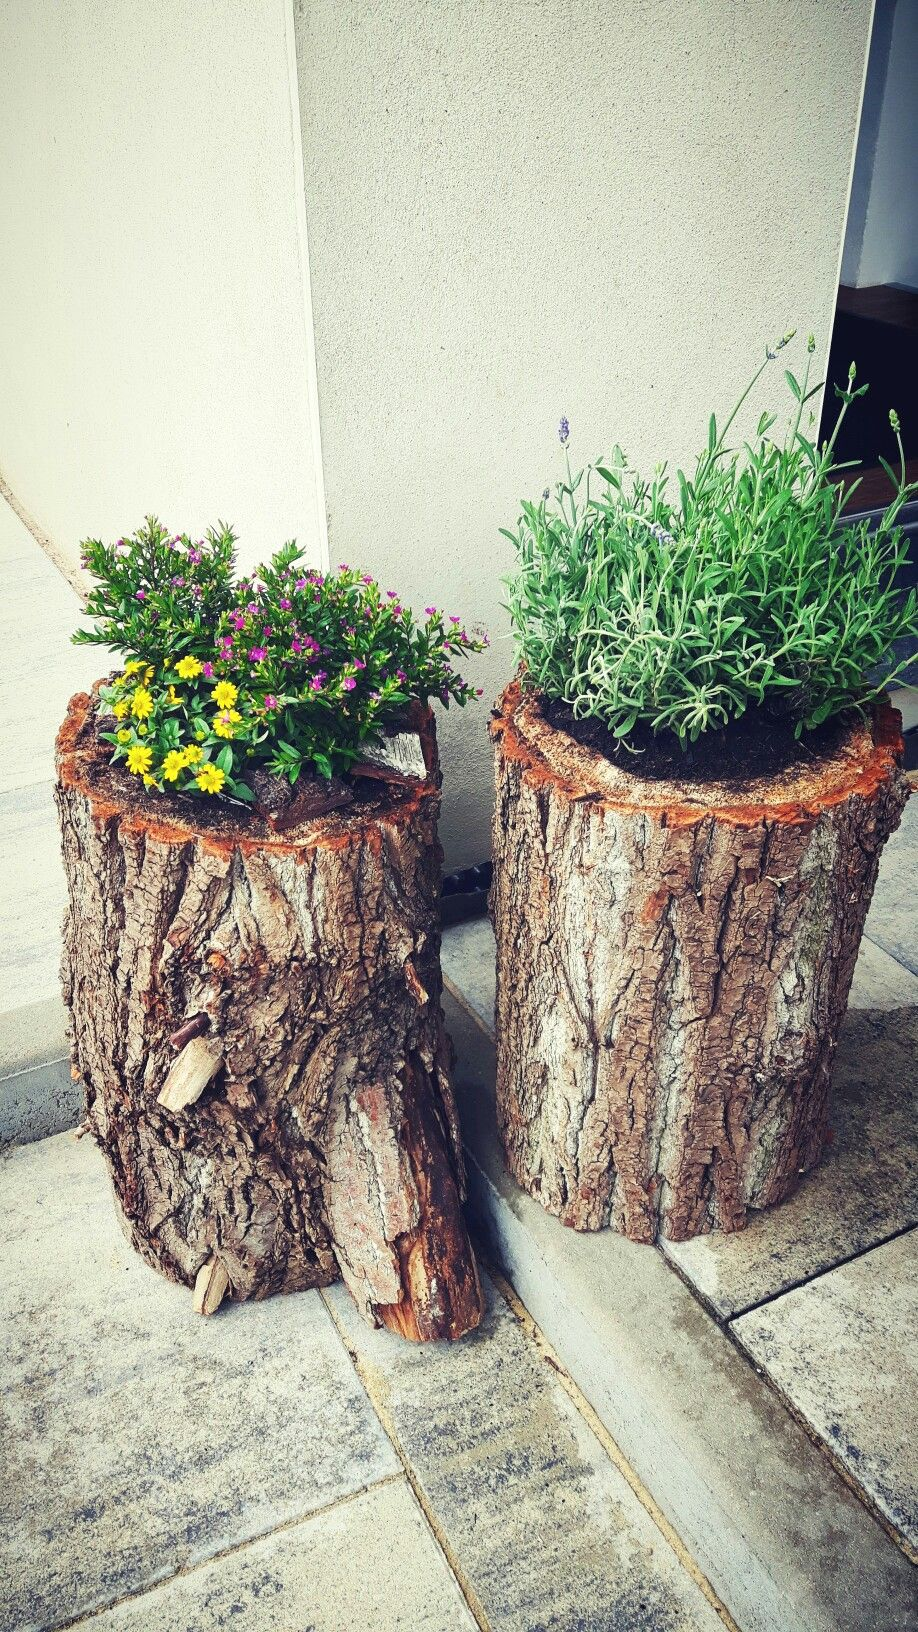 Hervorragend Hohler Baumstamm Bepflanzt